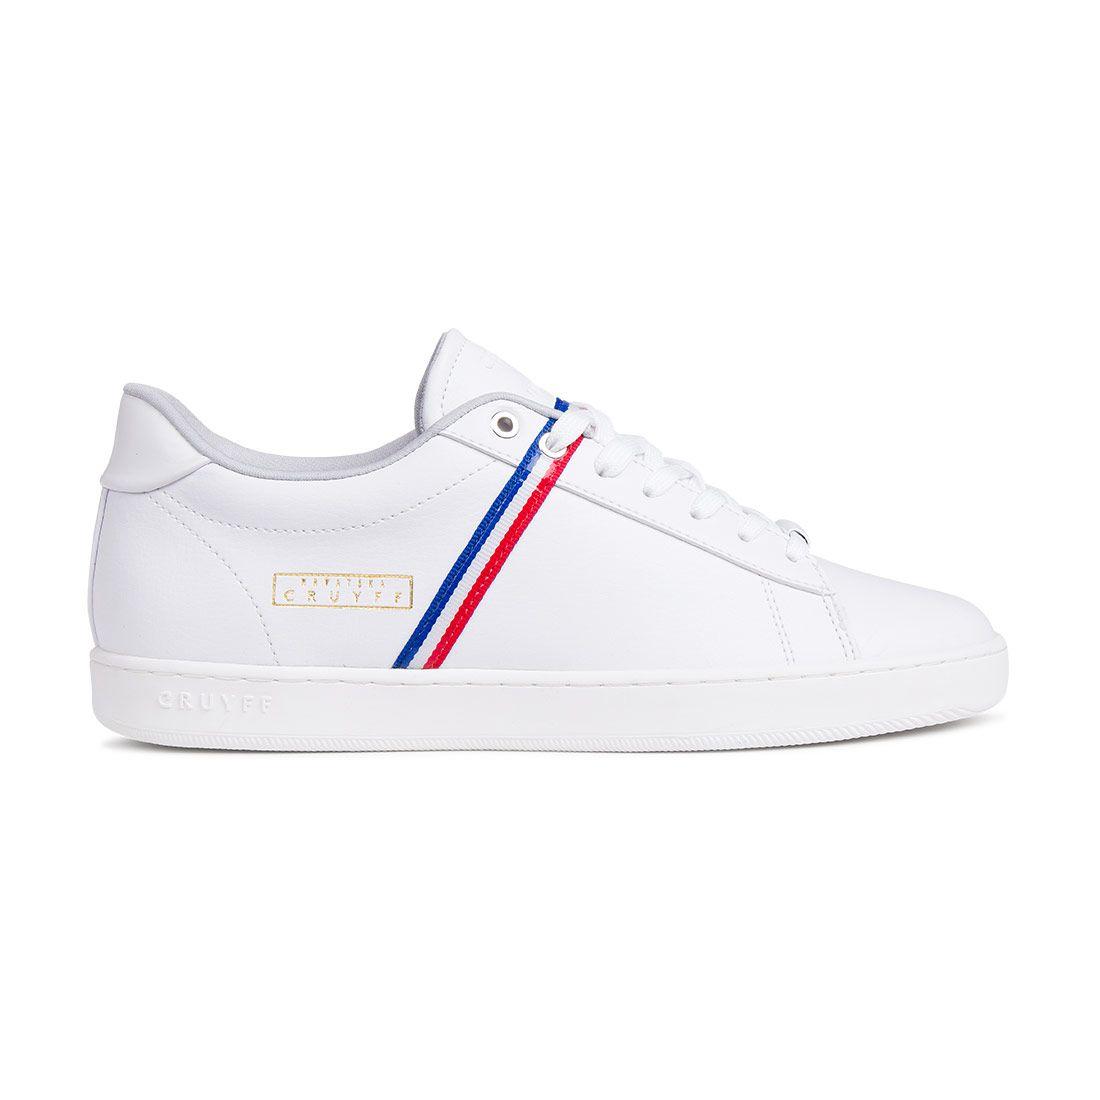 Cruyff Sylva Kroatië Sneakers Wit Donkerblauw Rood